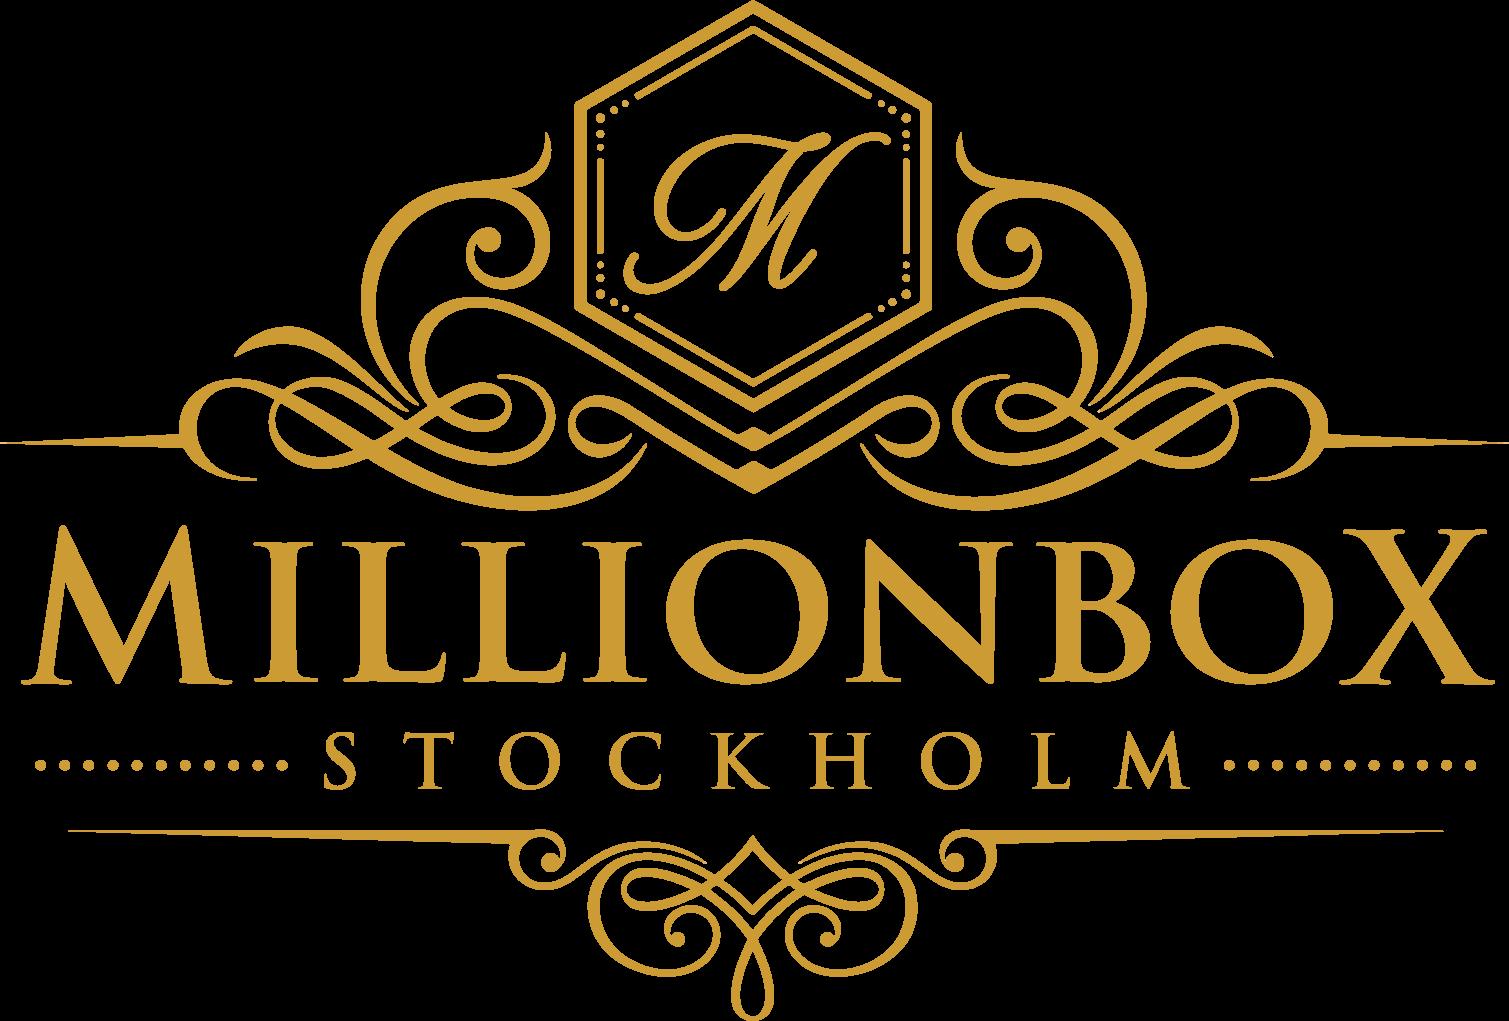 Millionbox.se